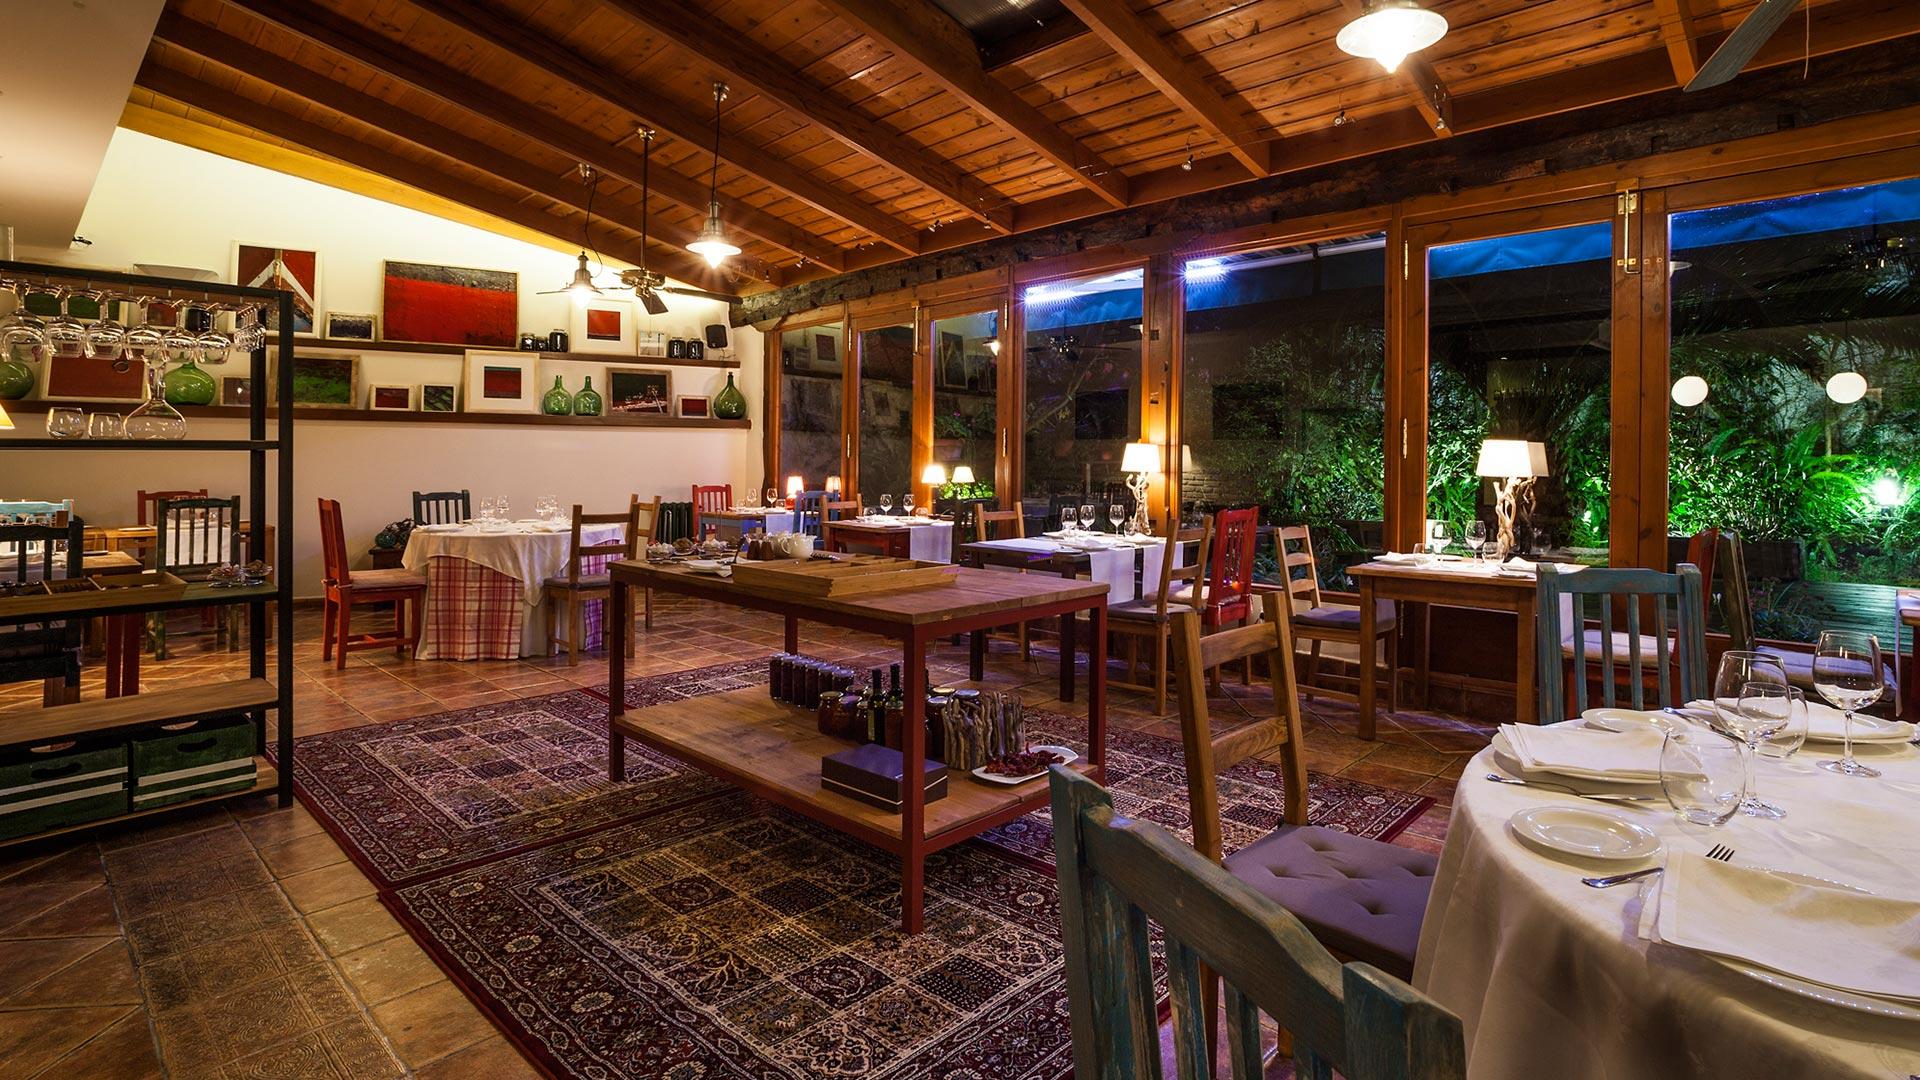 Restaurante cabo vidio 004